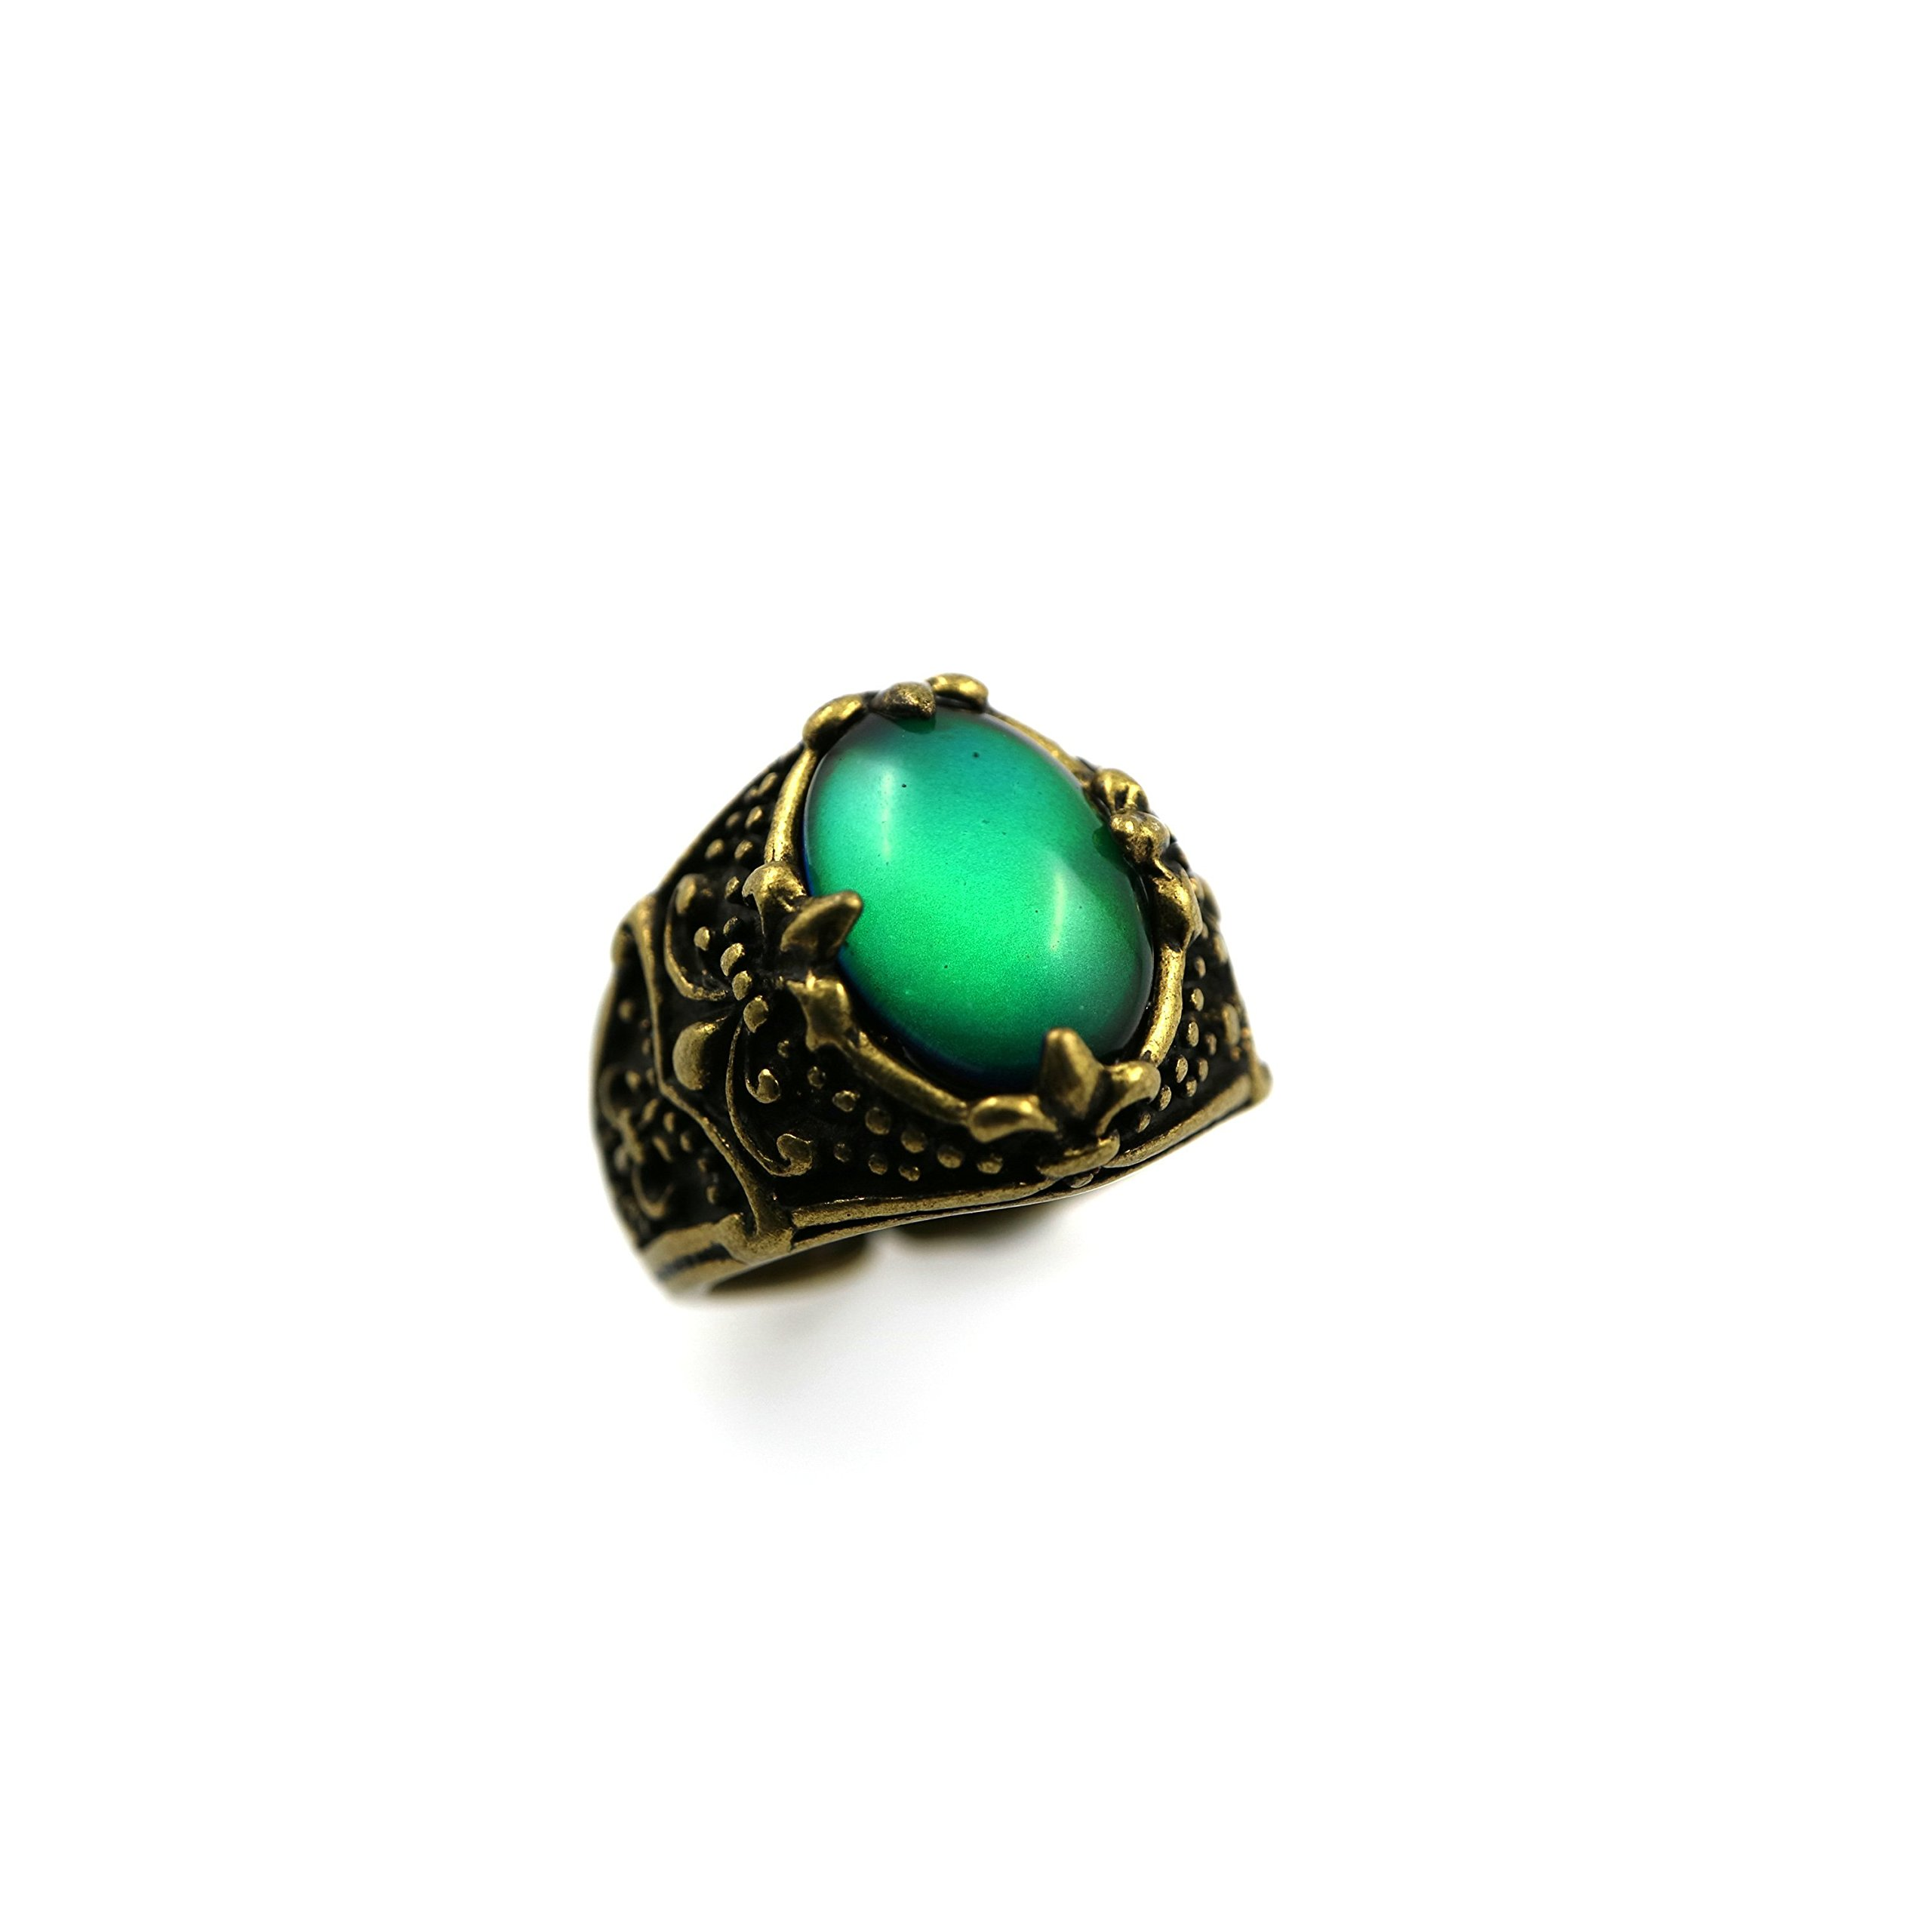 Ms.Iconic Vintage Style Oval Cabochon Fleur De Lis Color Change Mood Ring Adjustable Emotion Ring (Bronze)